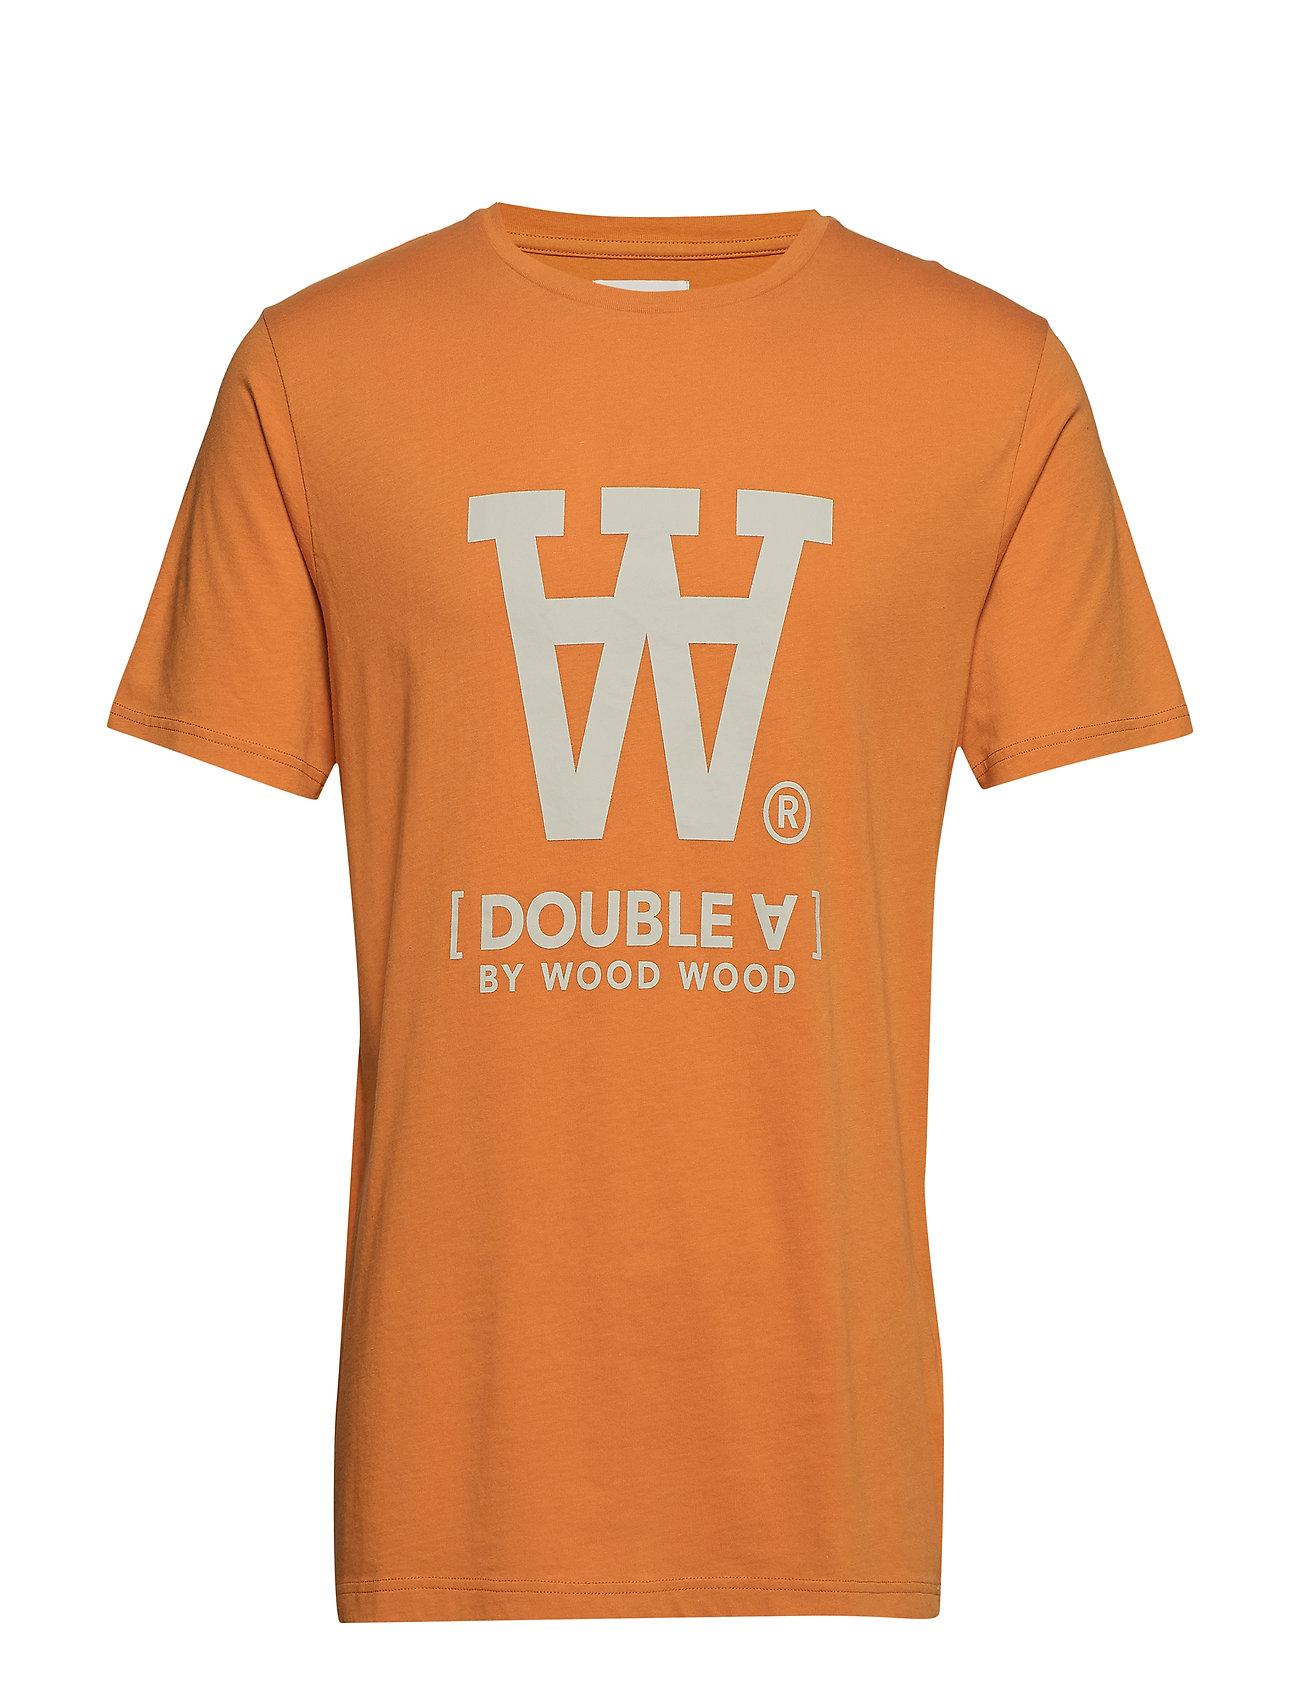 Ace T shirt